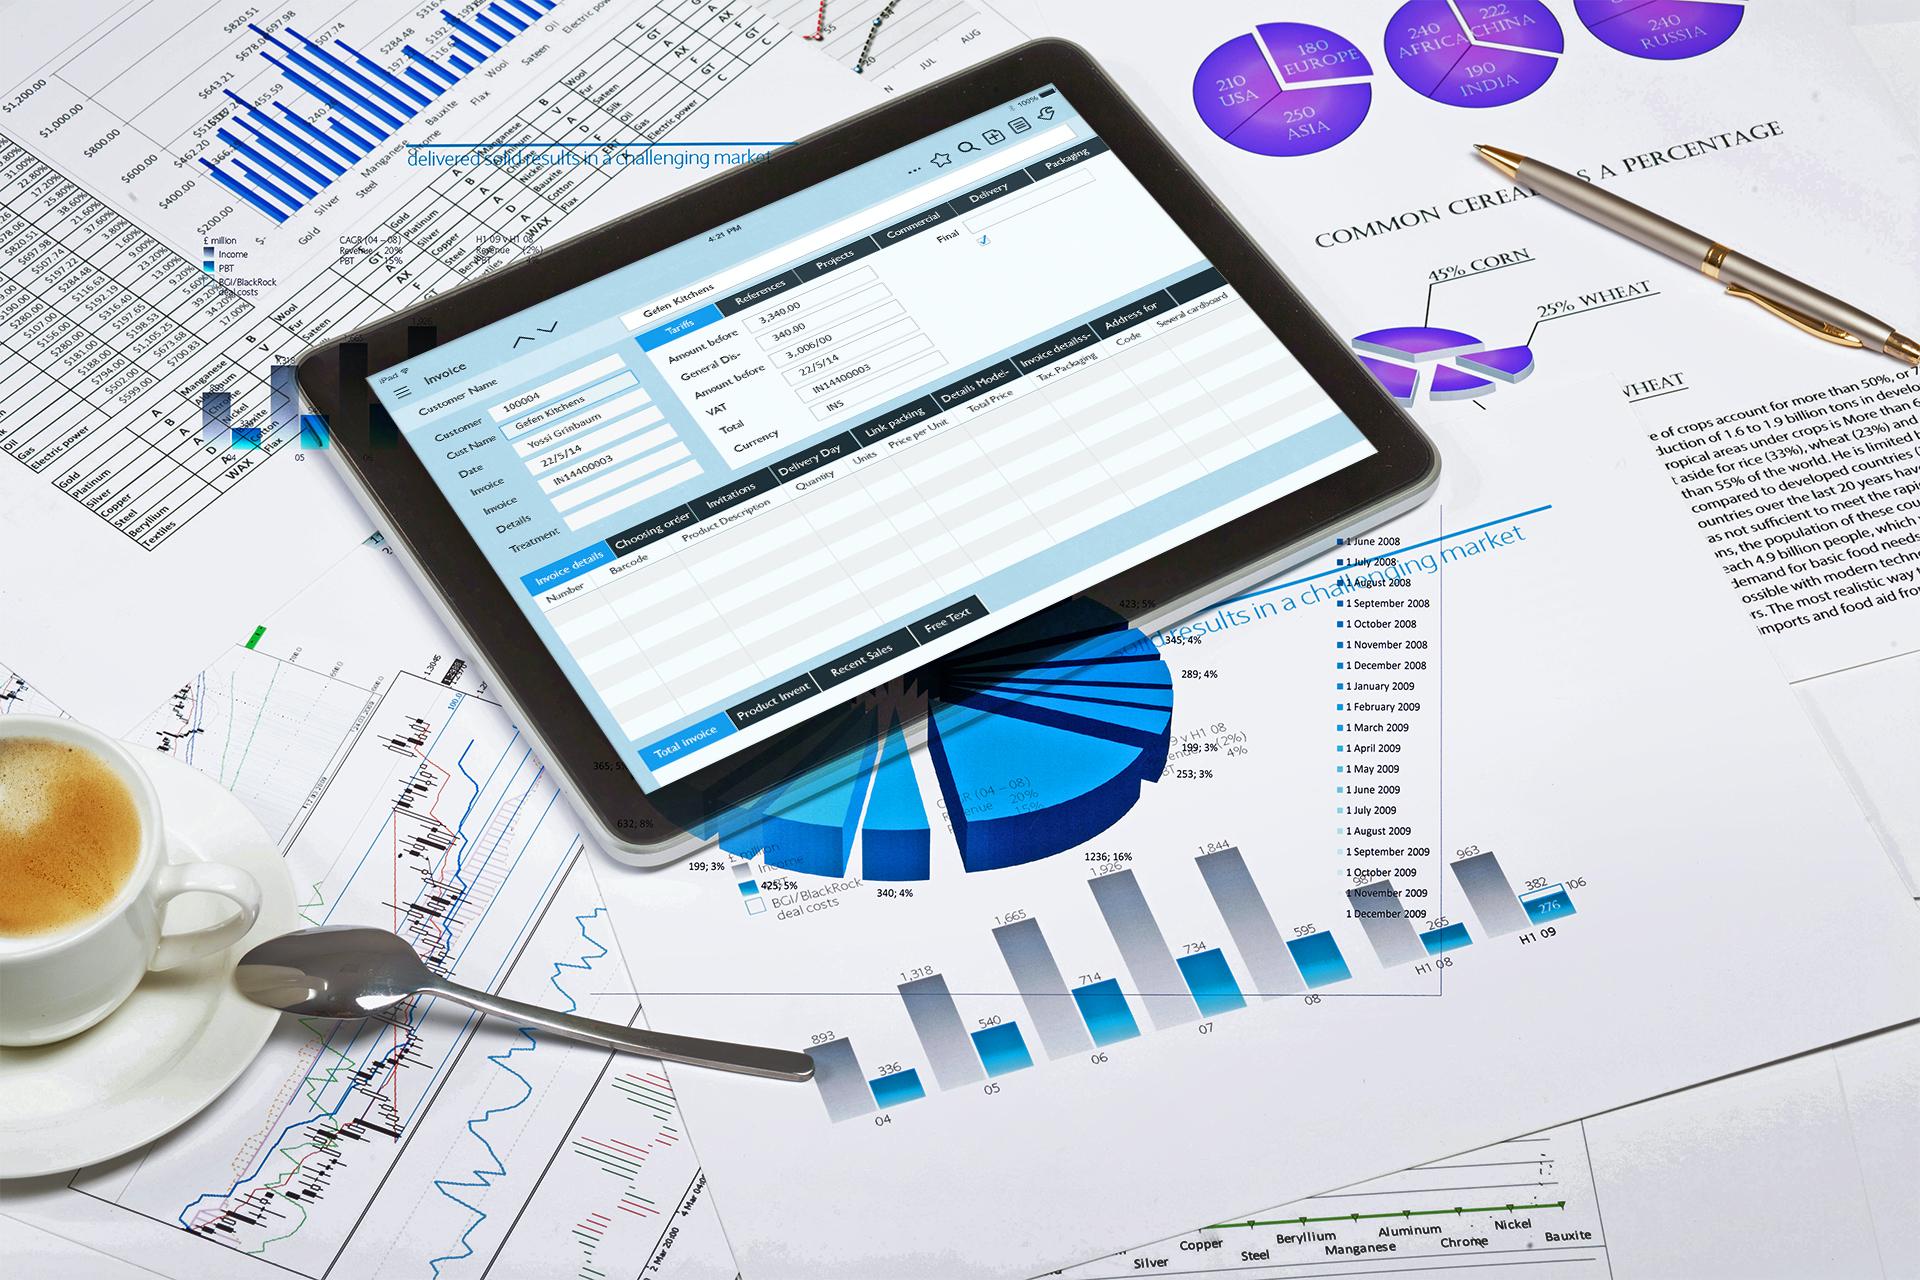 Priority Software - BI (Business Intelligence) Module